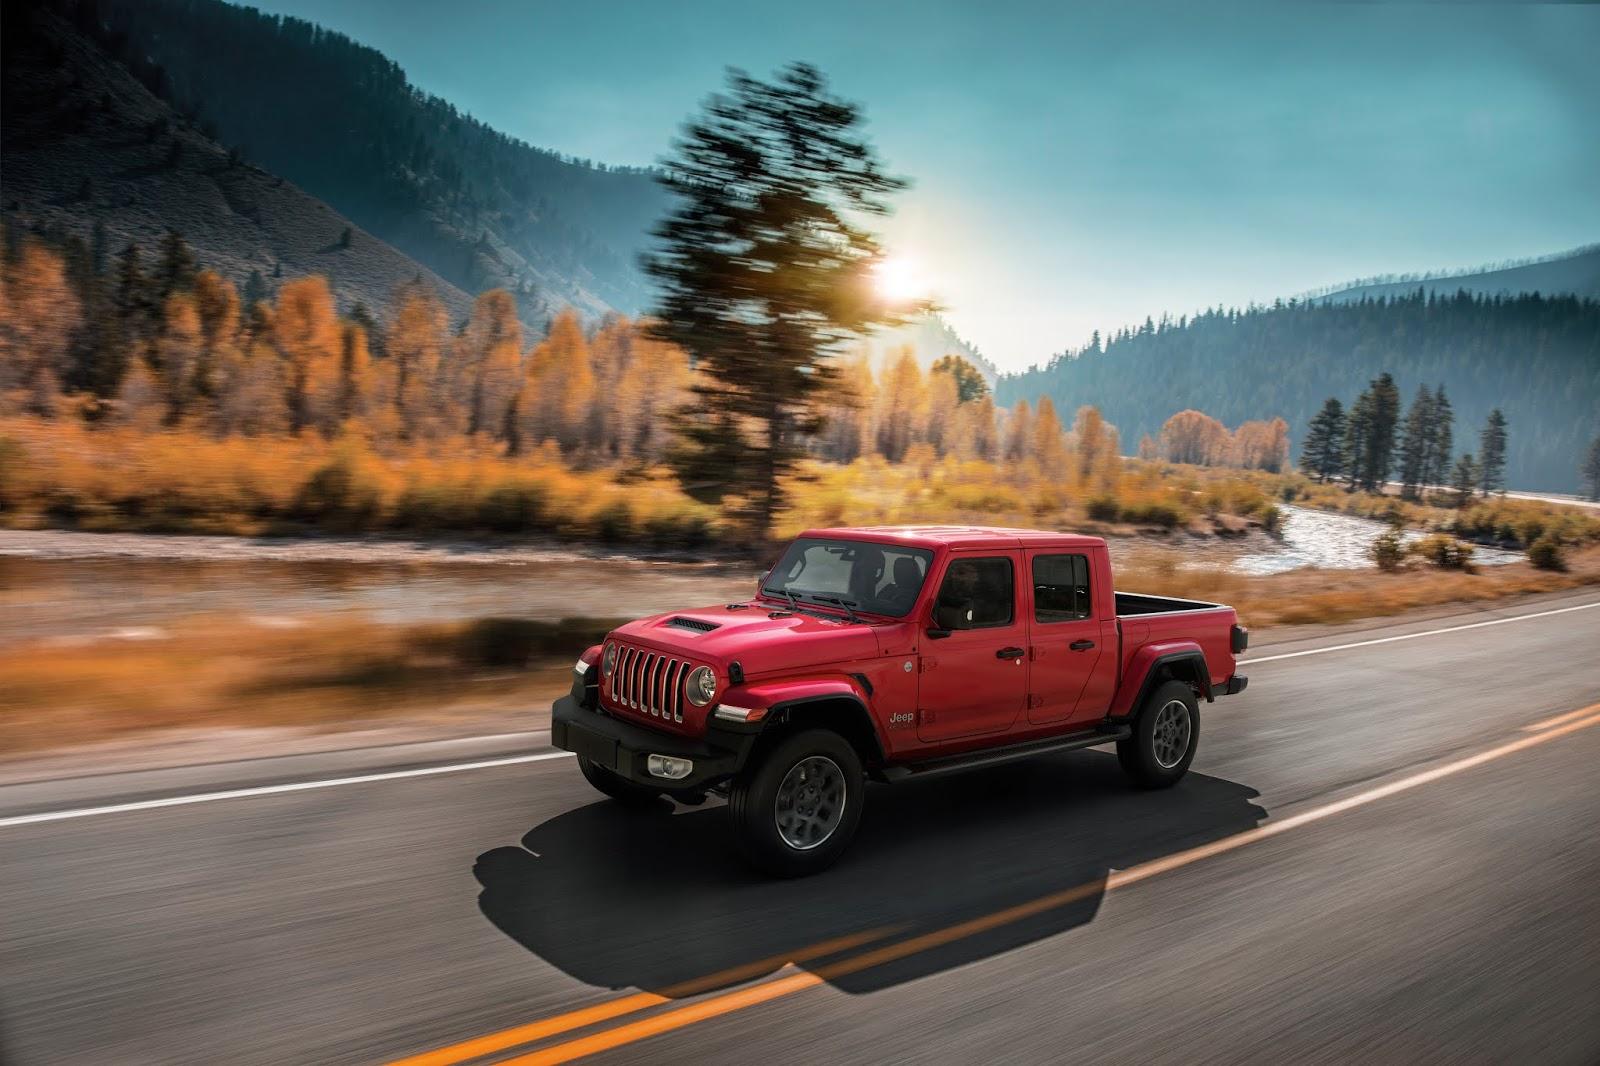 HP Overland2Bred To Jeep Gladiator, έρχεται να αλλάξει τα δεδομένα στην κατηγορία των pick-up Gladiator, Jeep, Jeep Gladiator, zblog, ειδήσεις